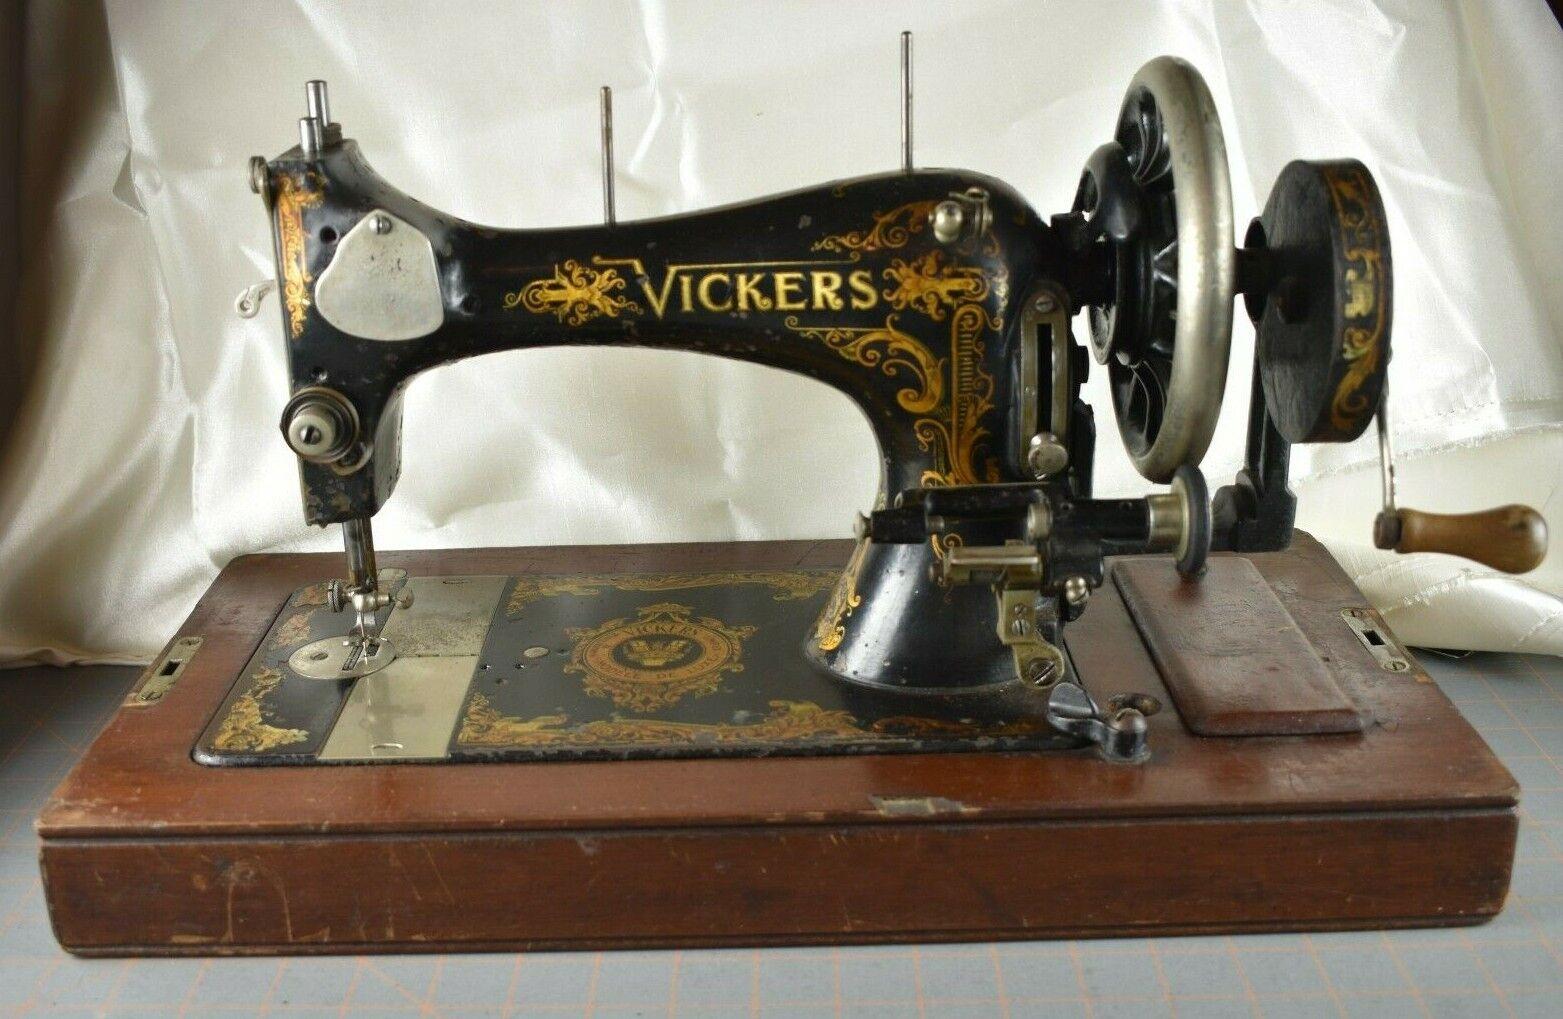 Vickers Modele de Luxe: Serial No. C1-15065. This machine